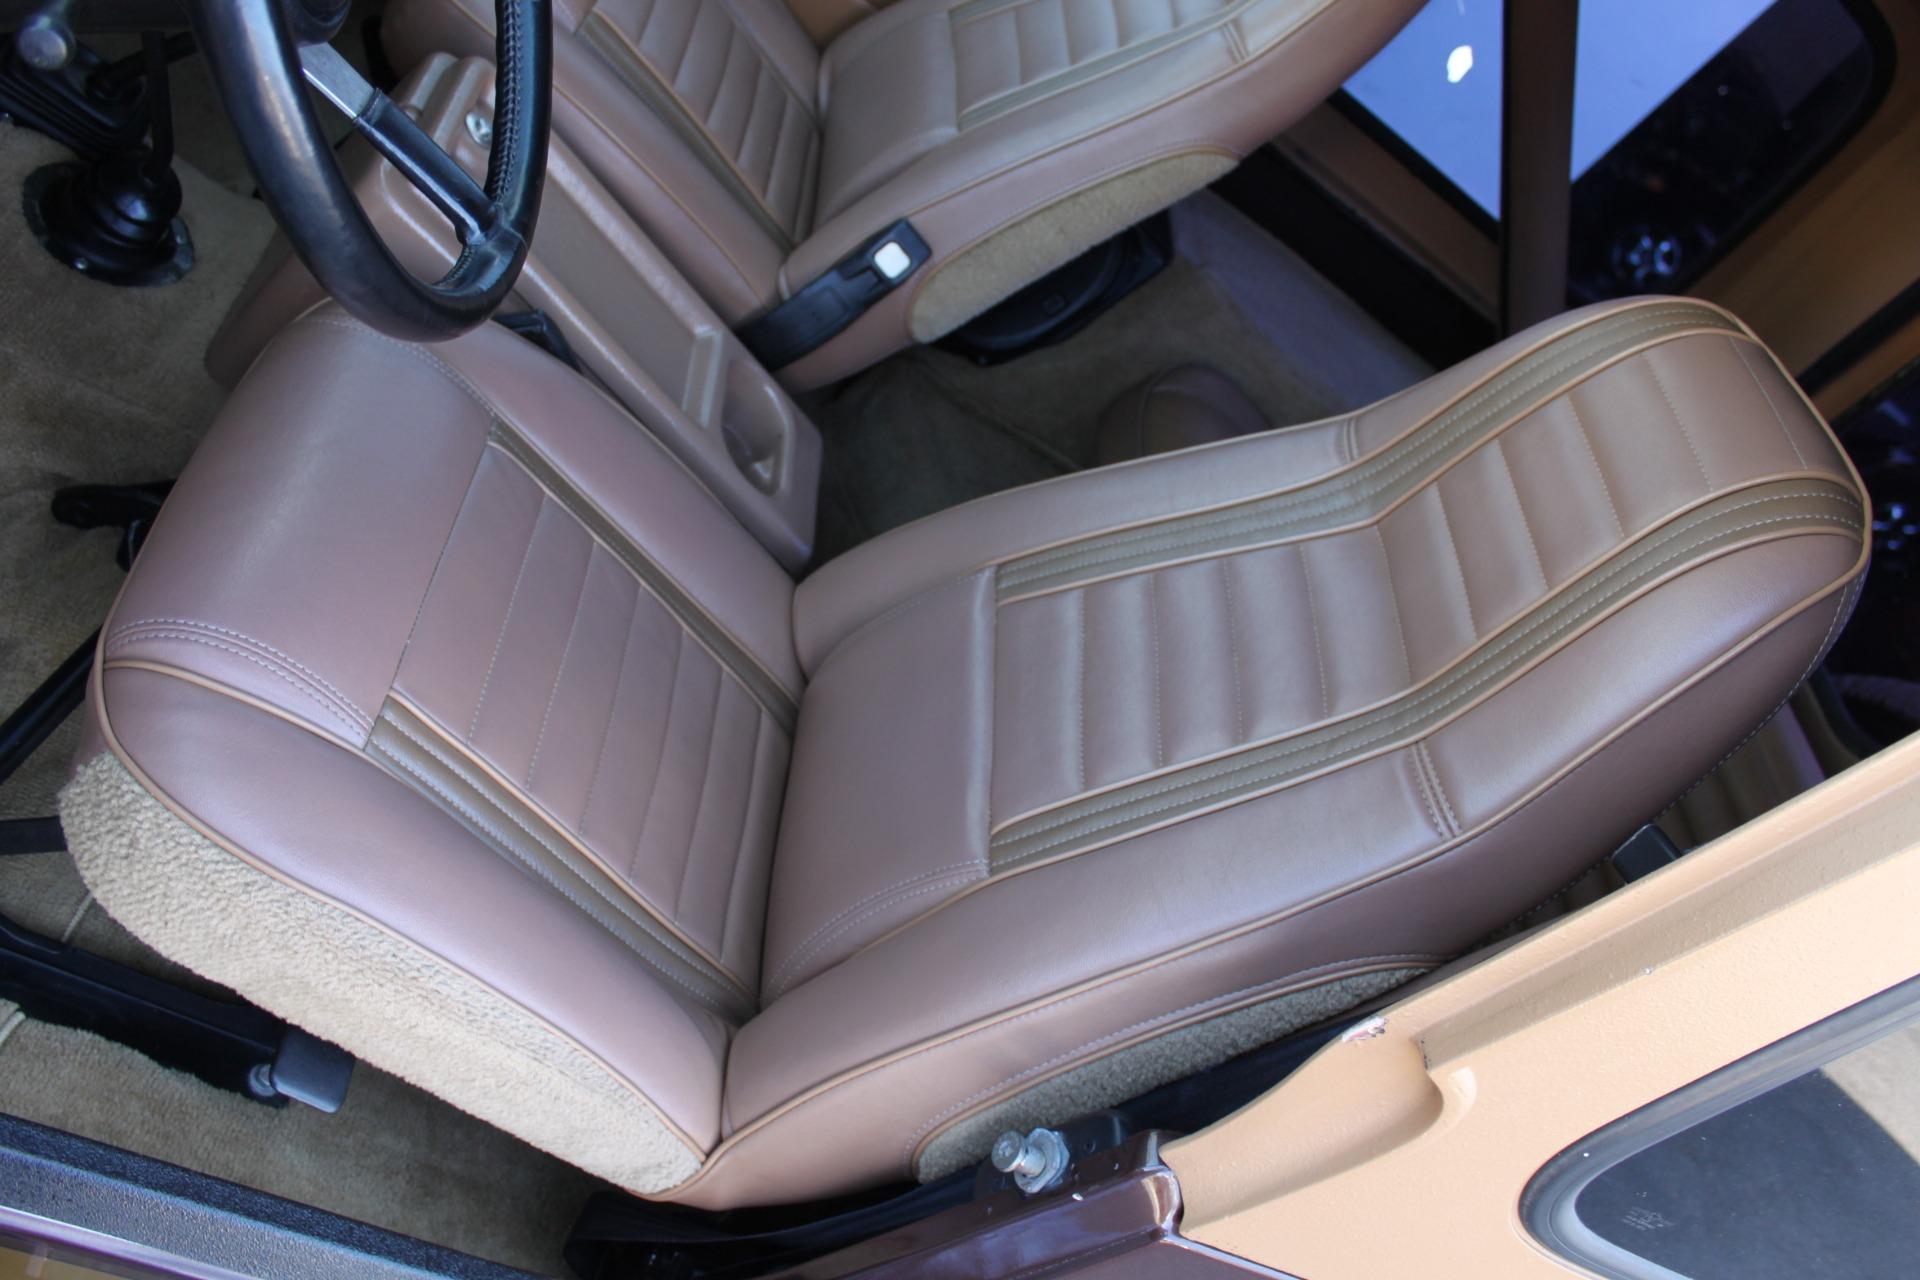 Used-1985-Jeep-CJ-7-Laredo-4WD-Grand-Wagoneer